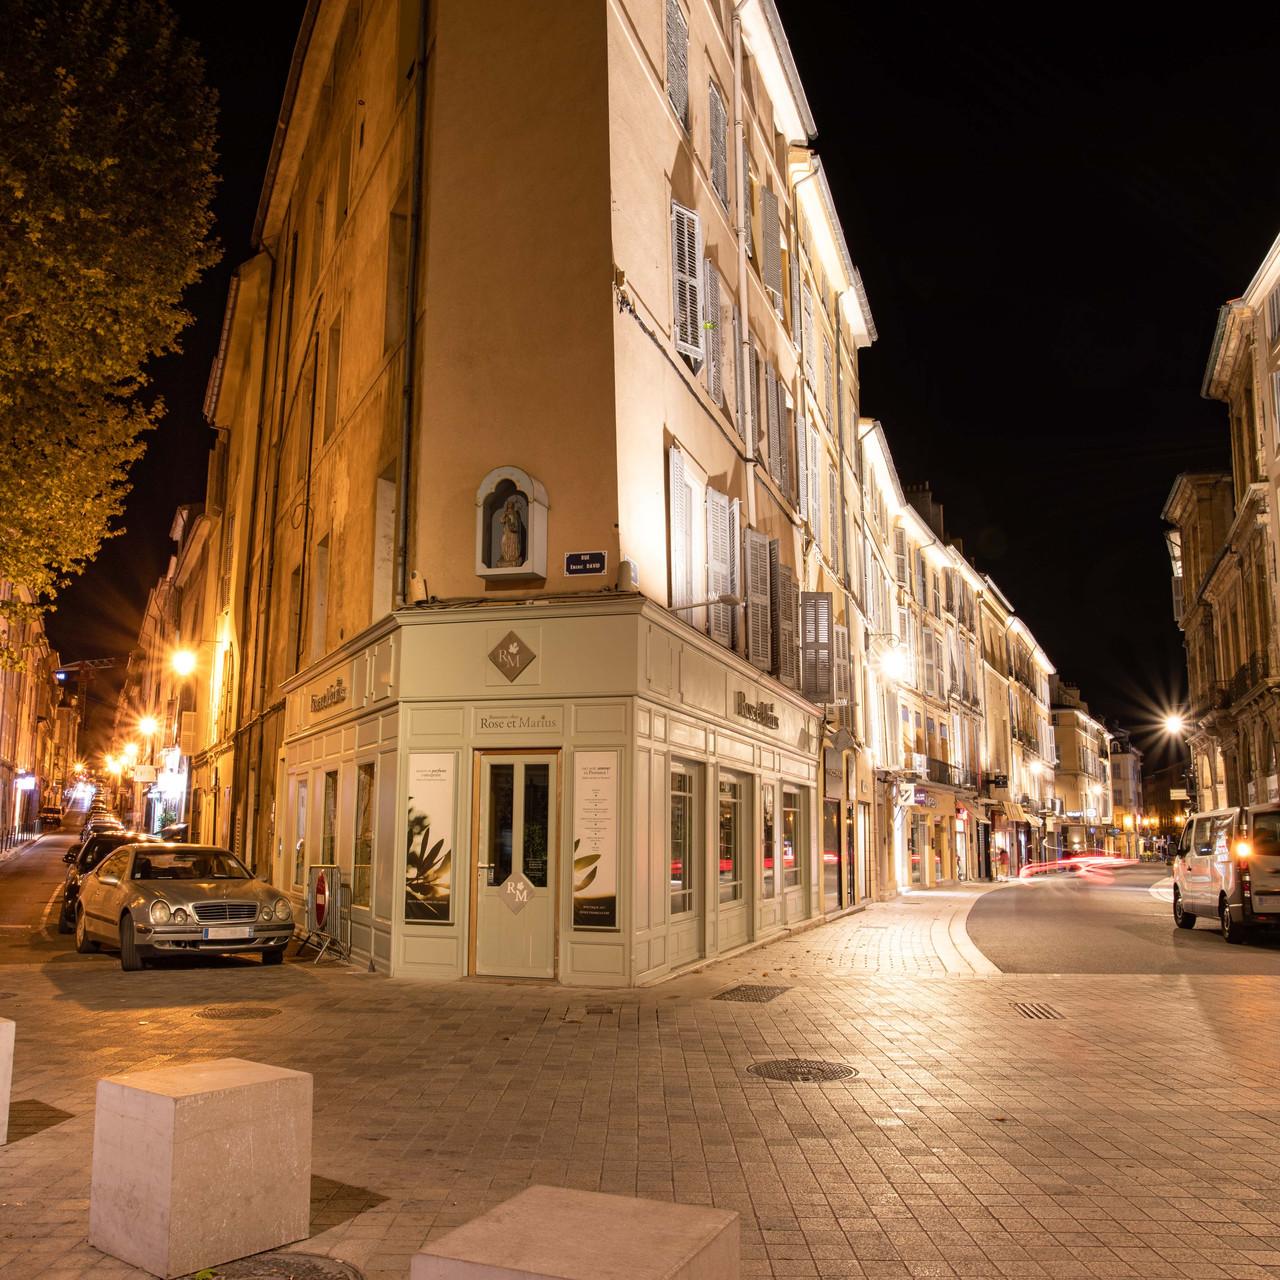 Ville la nuit (iso100-f13-13sec) no nigh